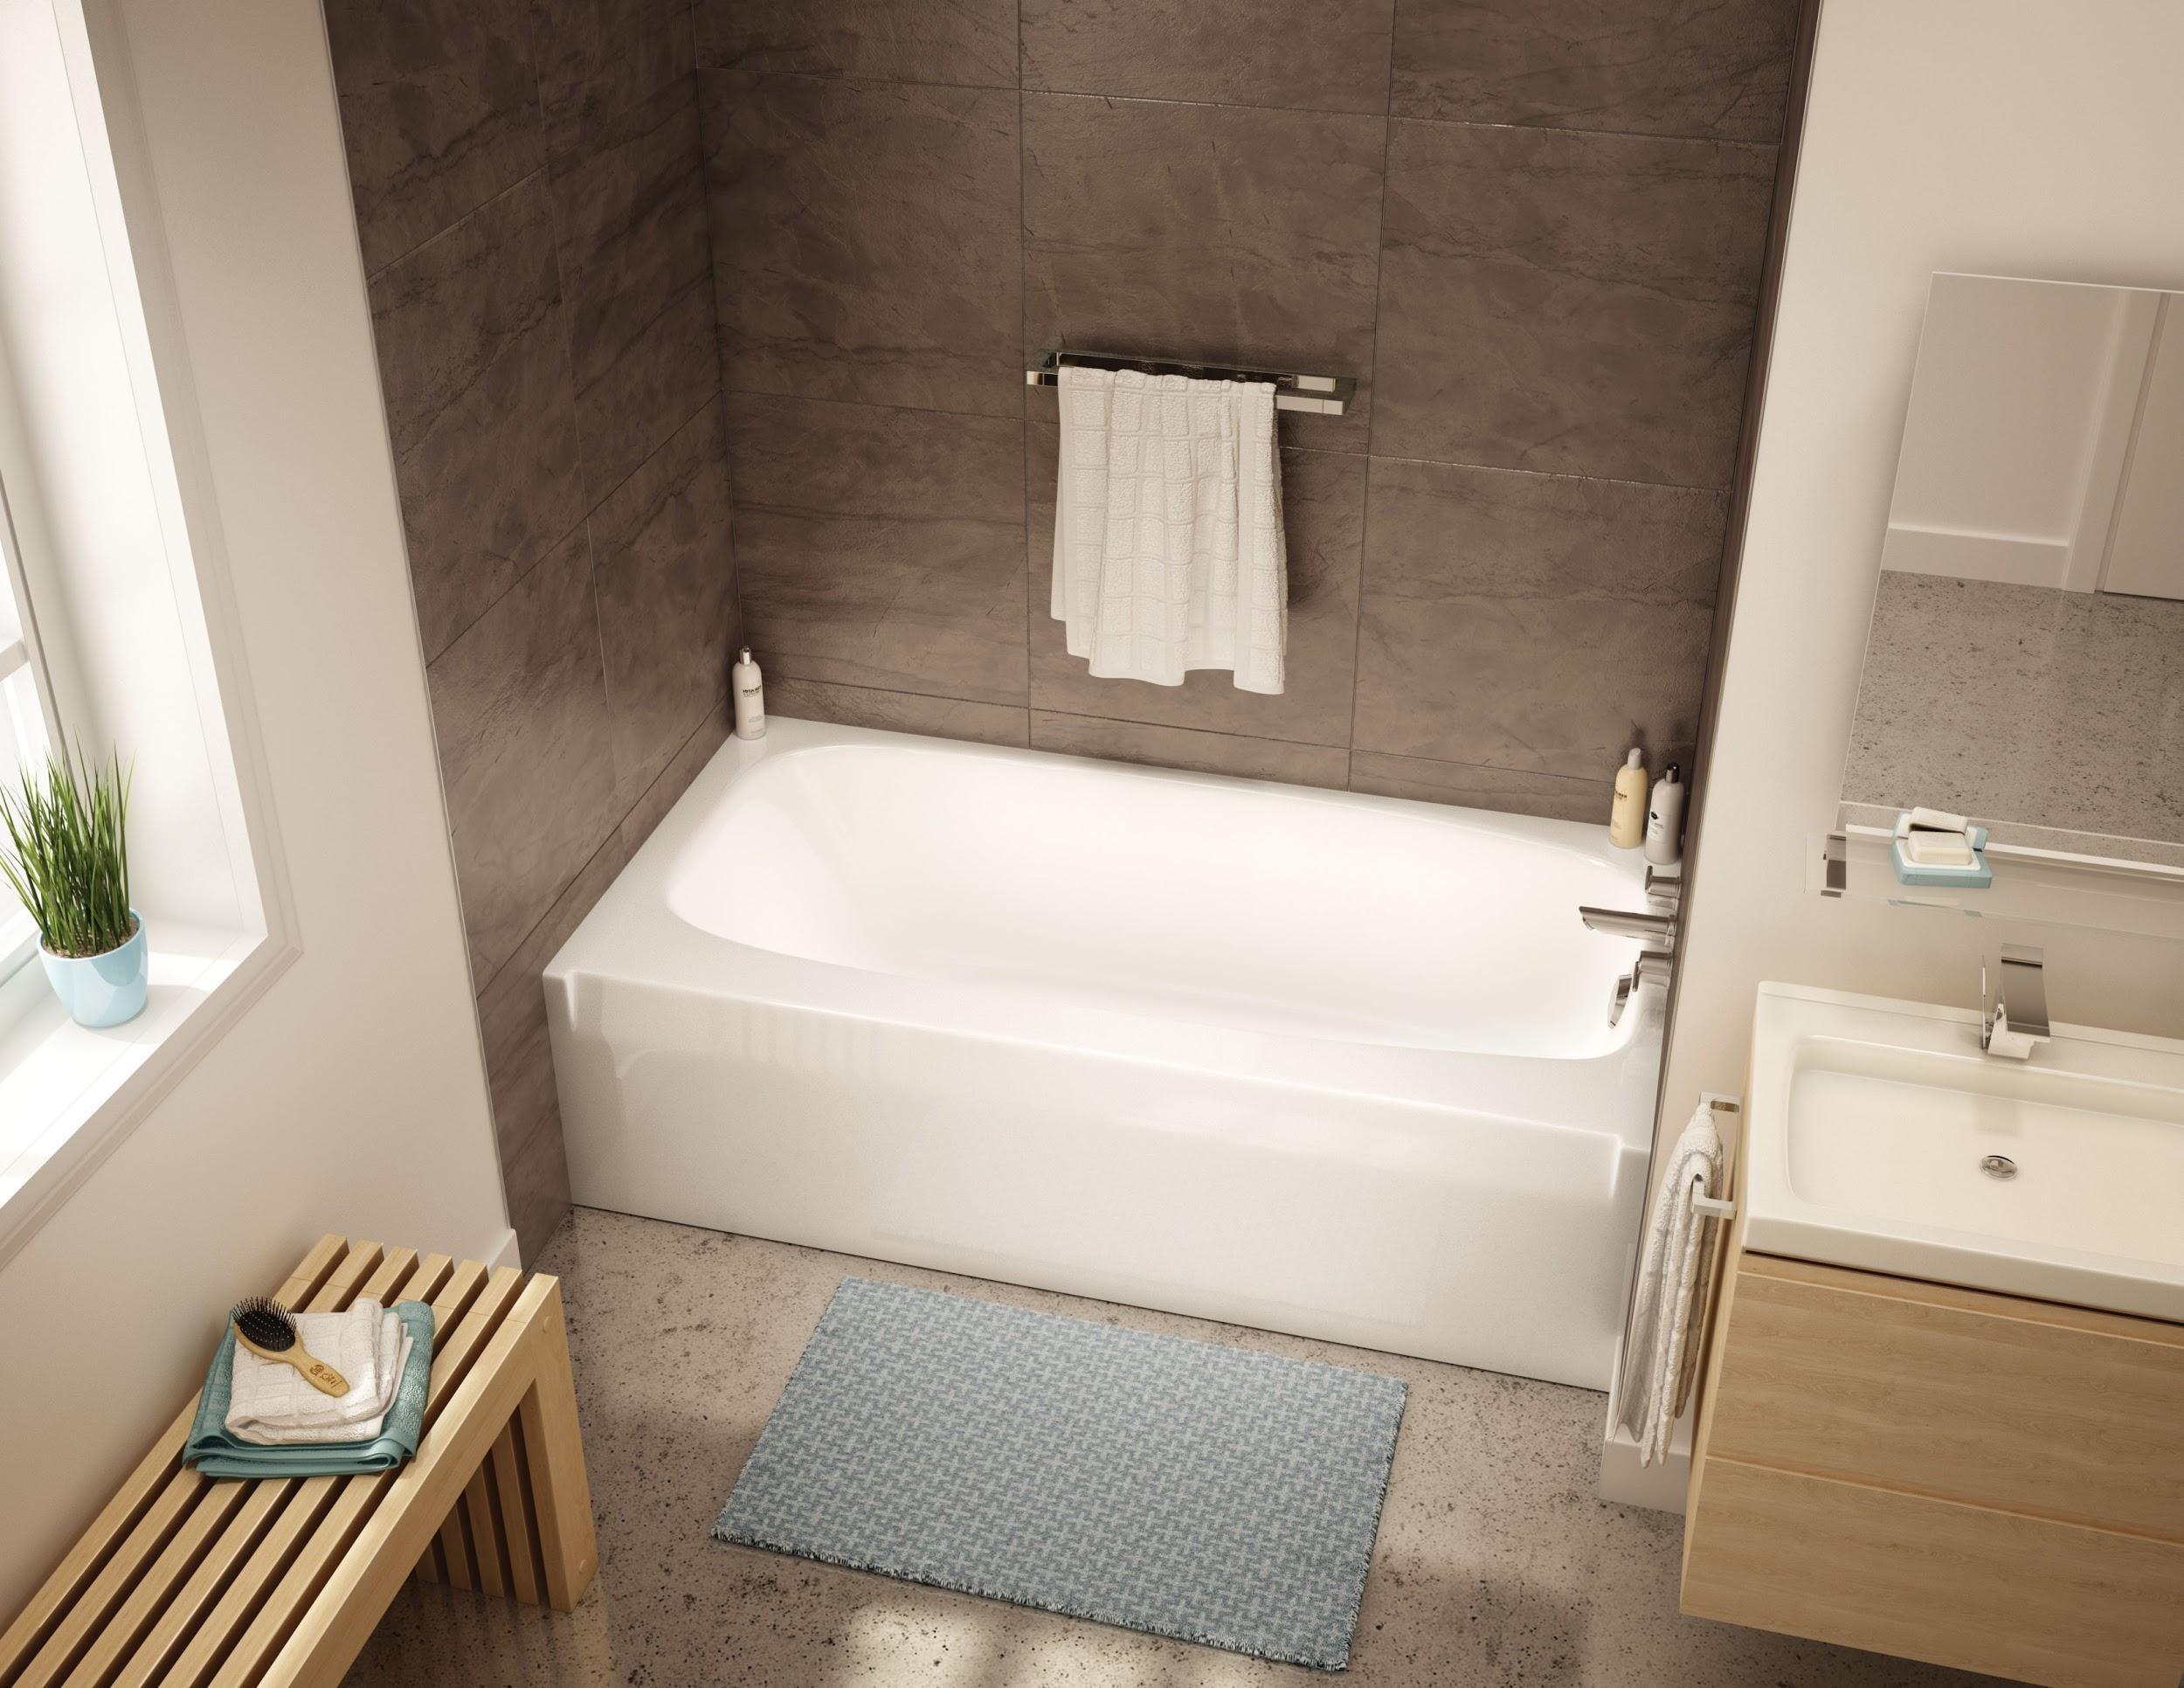 remodeling ideas bathtubs undermount remodel bathroom bathtub pin manassas